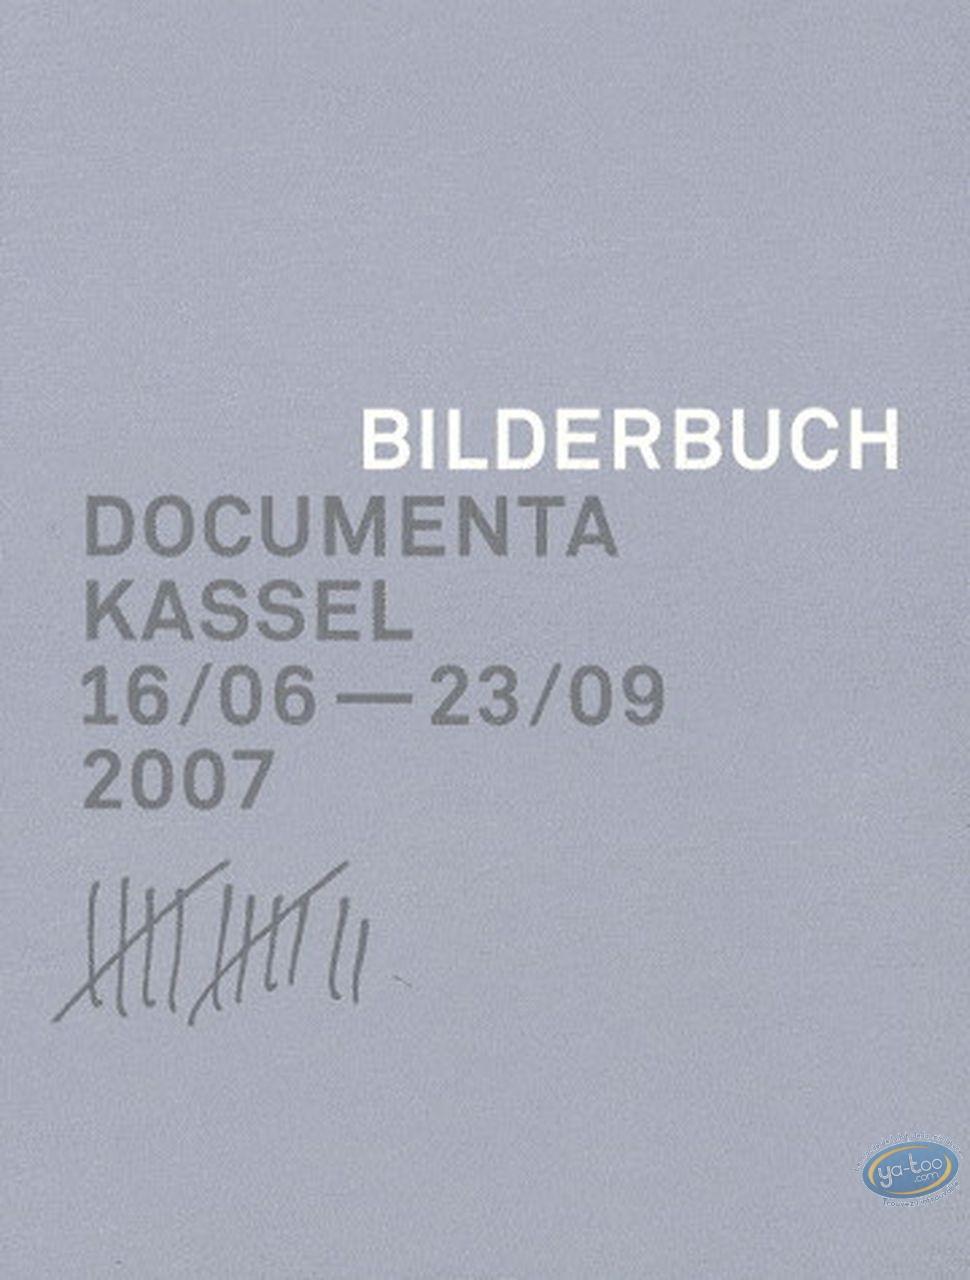 Book, Bilderbuch - Documenta Kassel 16/06 - 23/09 2006